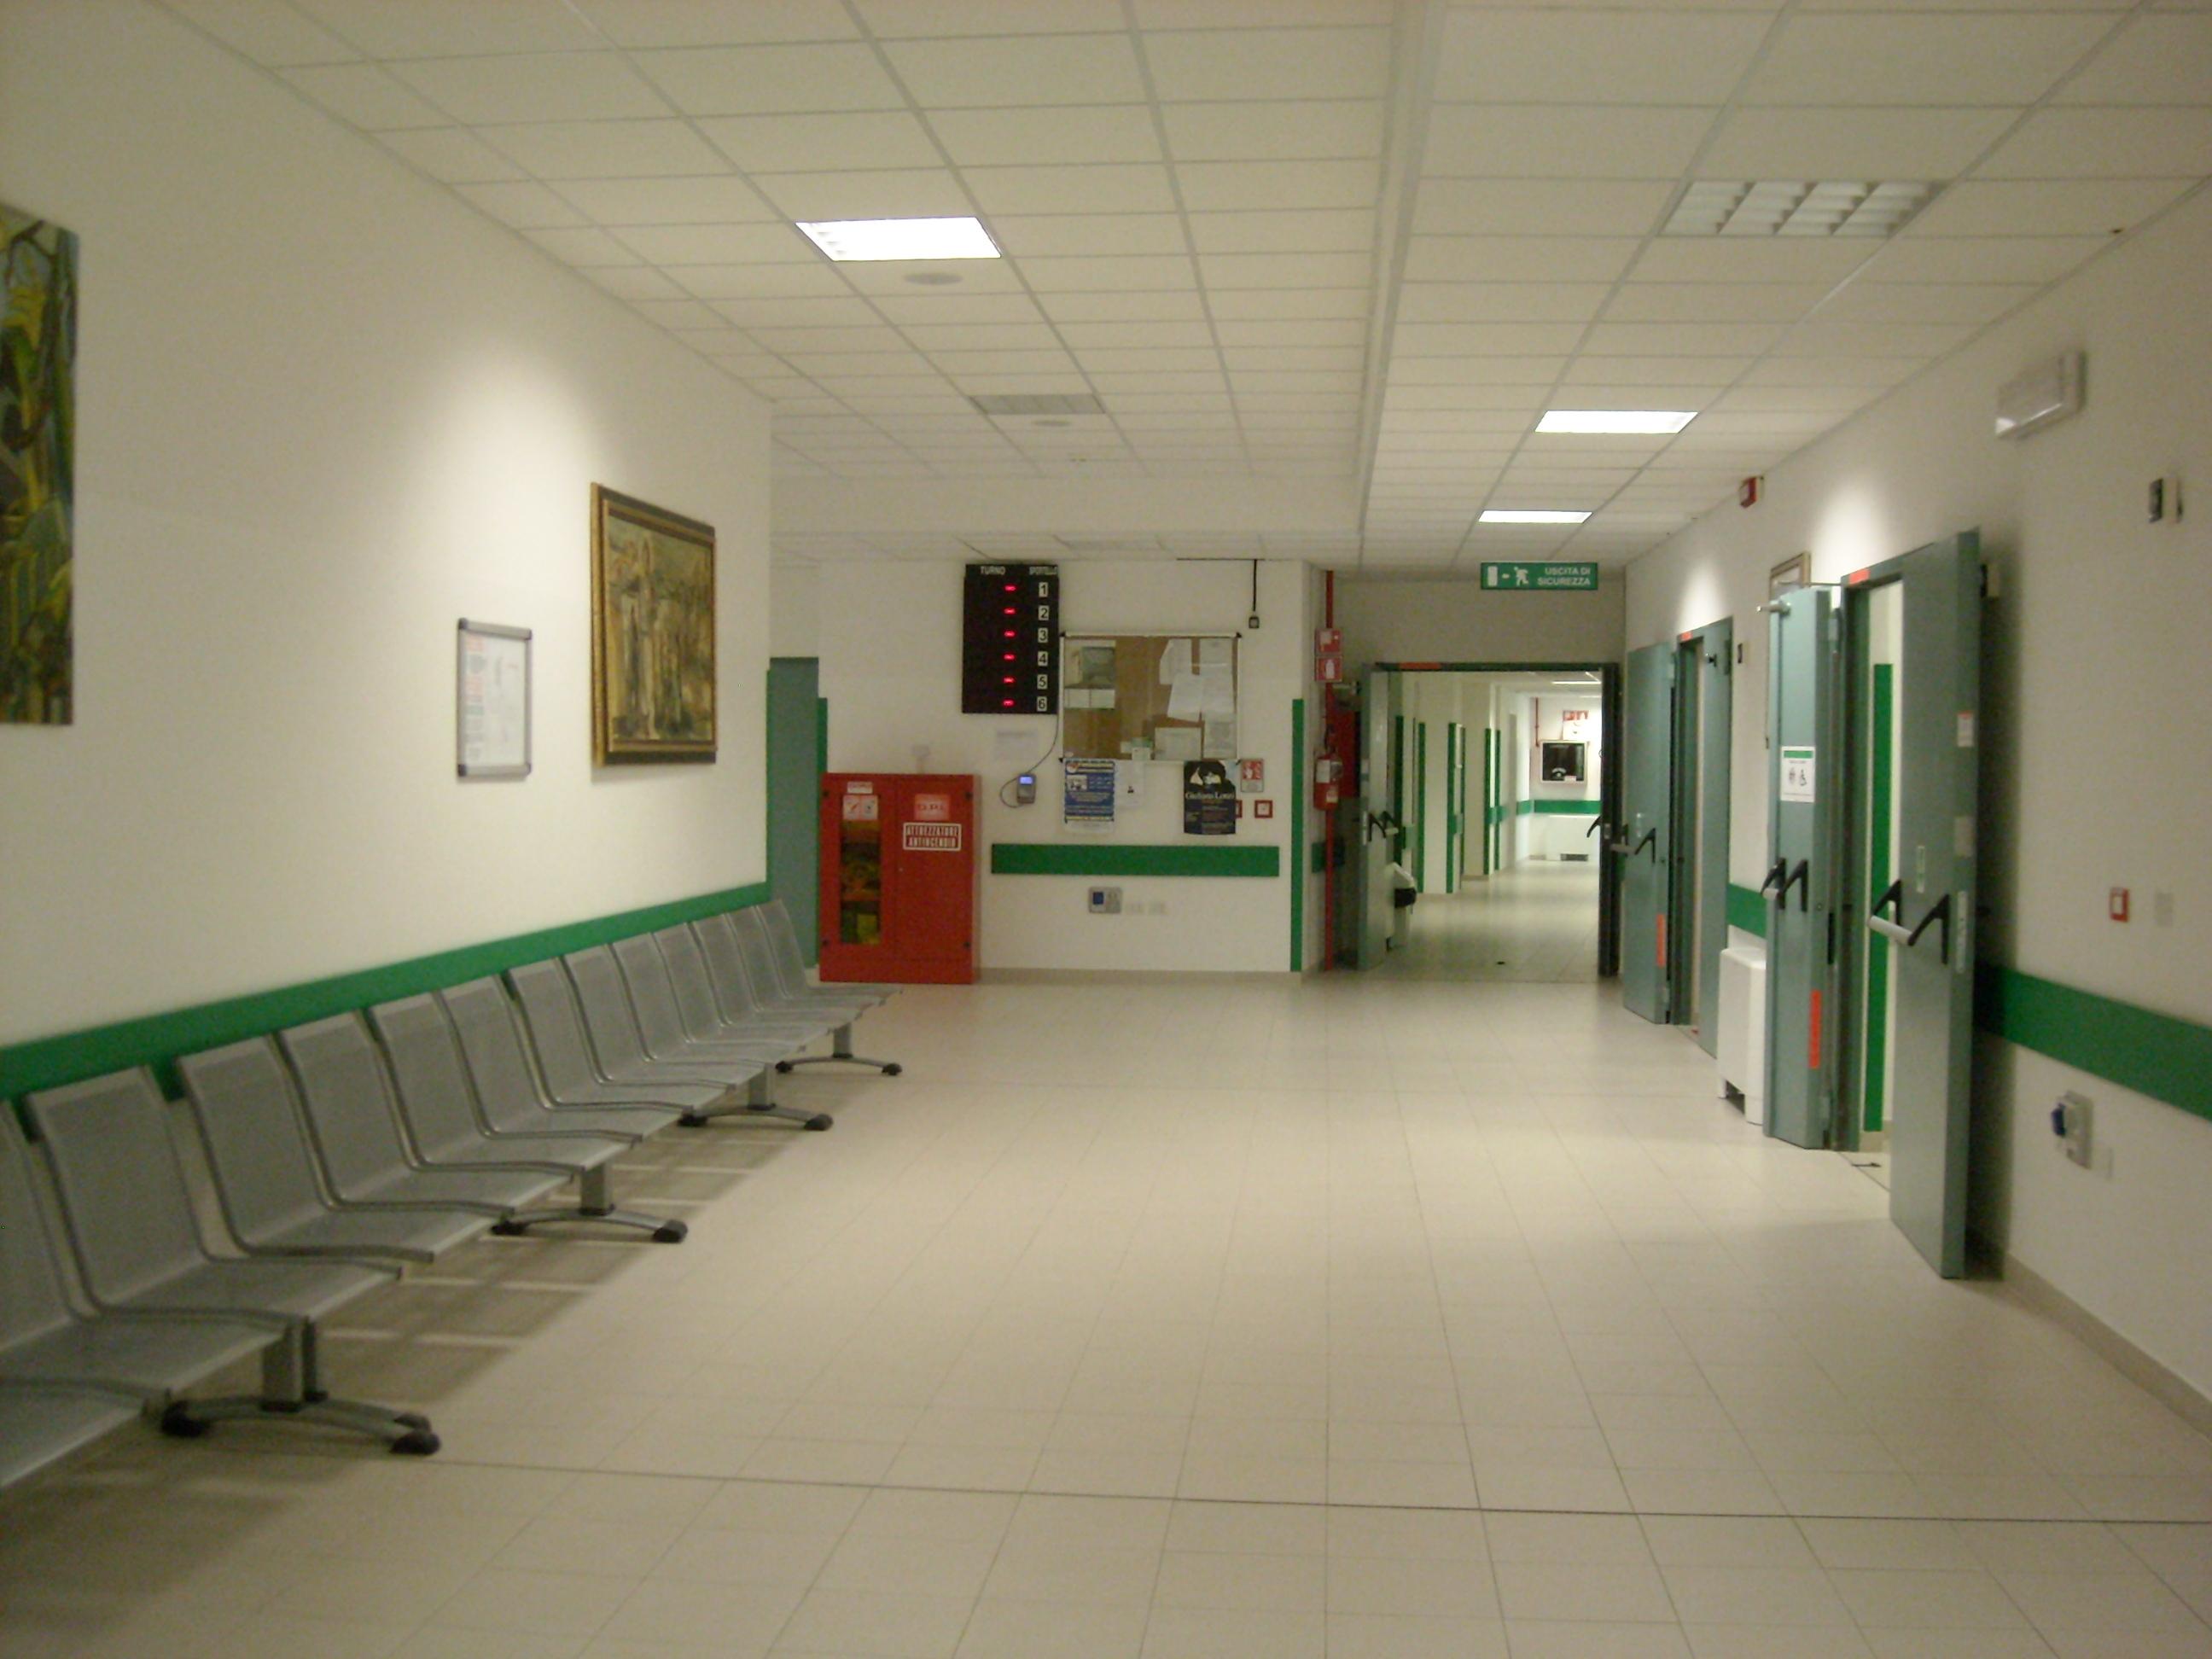 Ospedale_21secolo_emanuelemarino